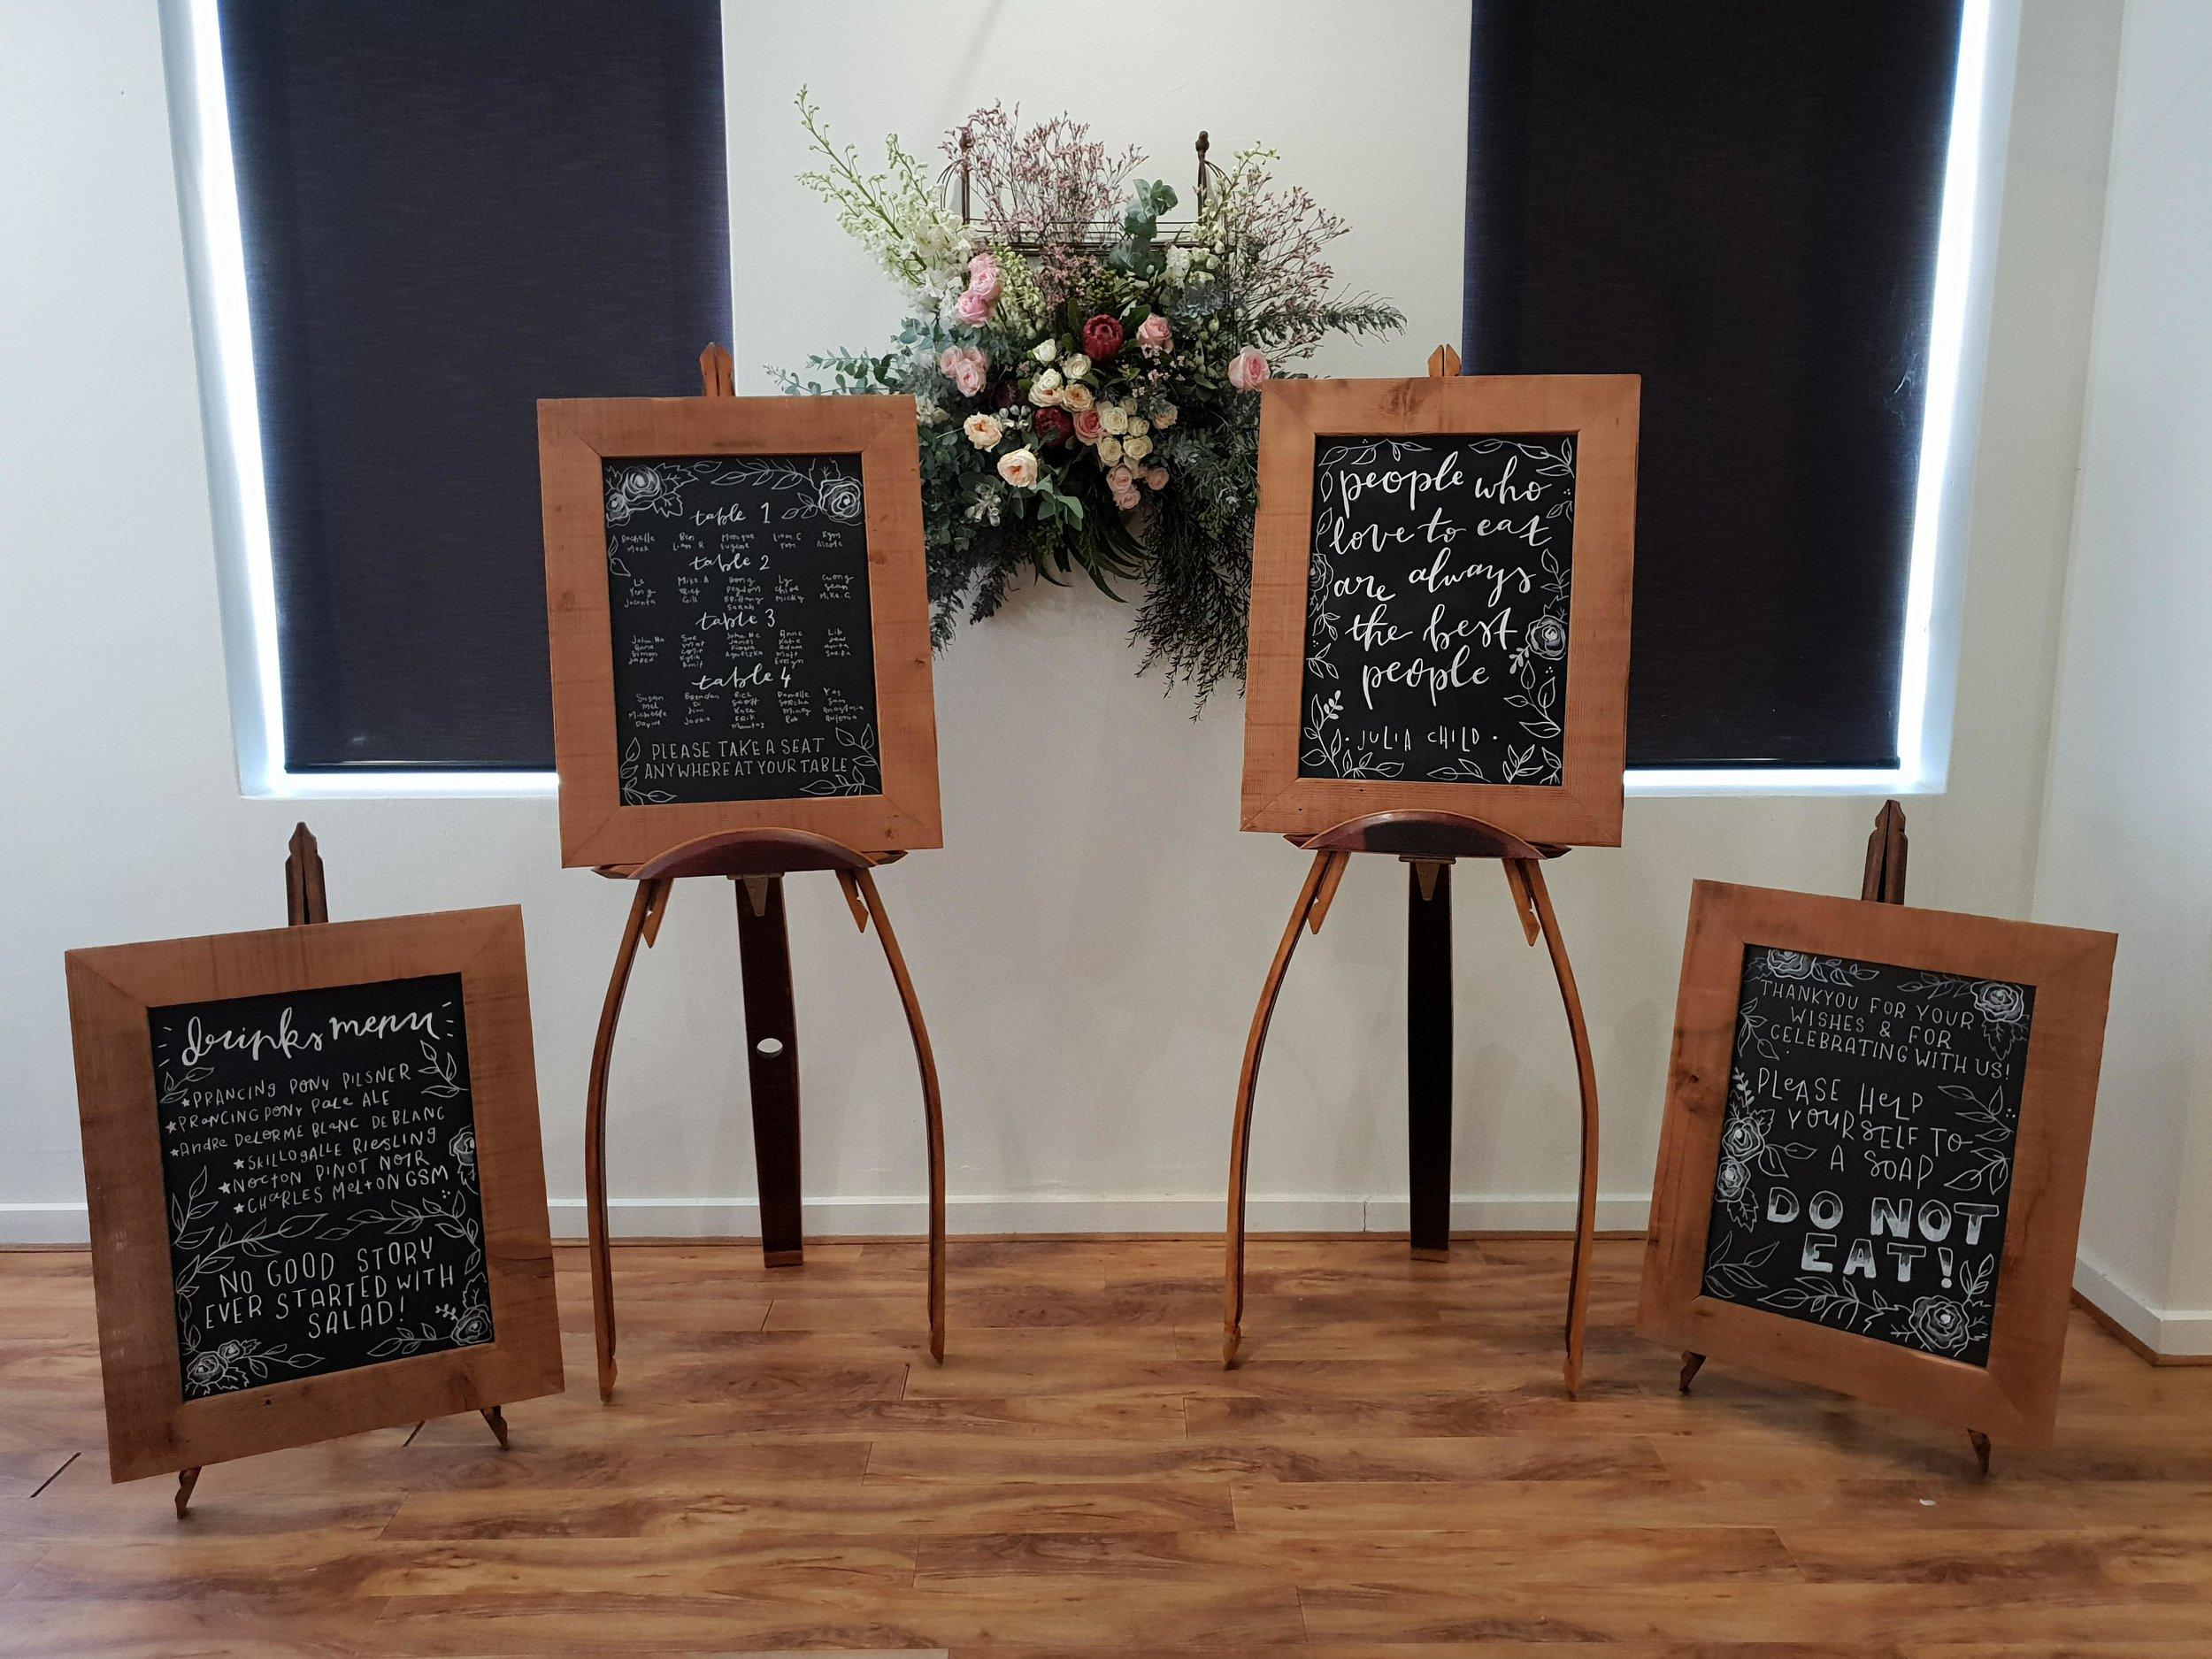 The Rustic Barn reclaimed Oregon chalkboard and wine barrel easel hire